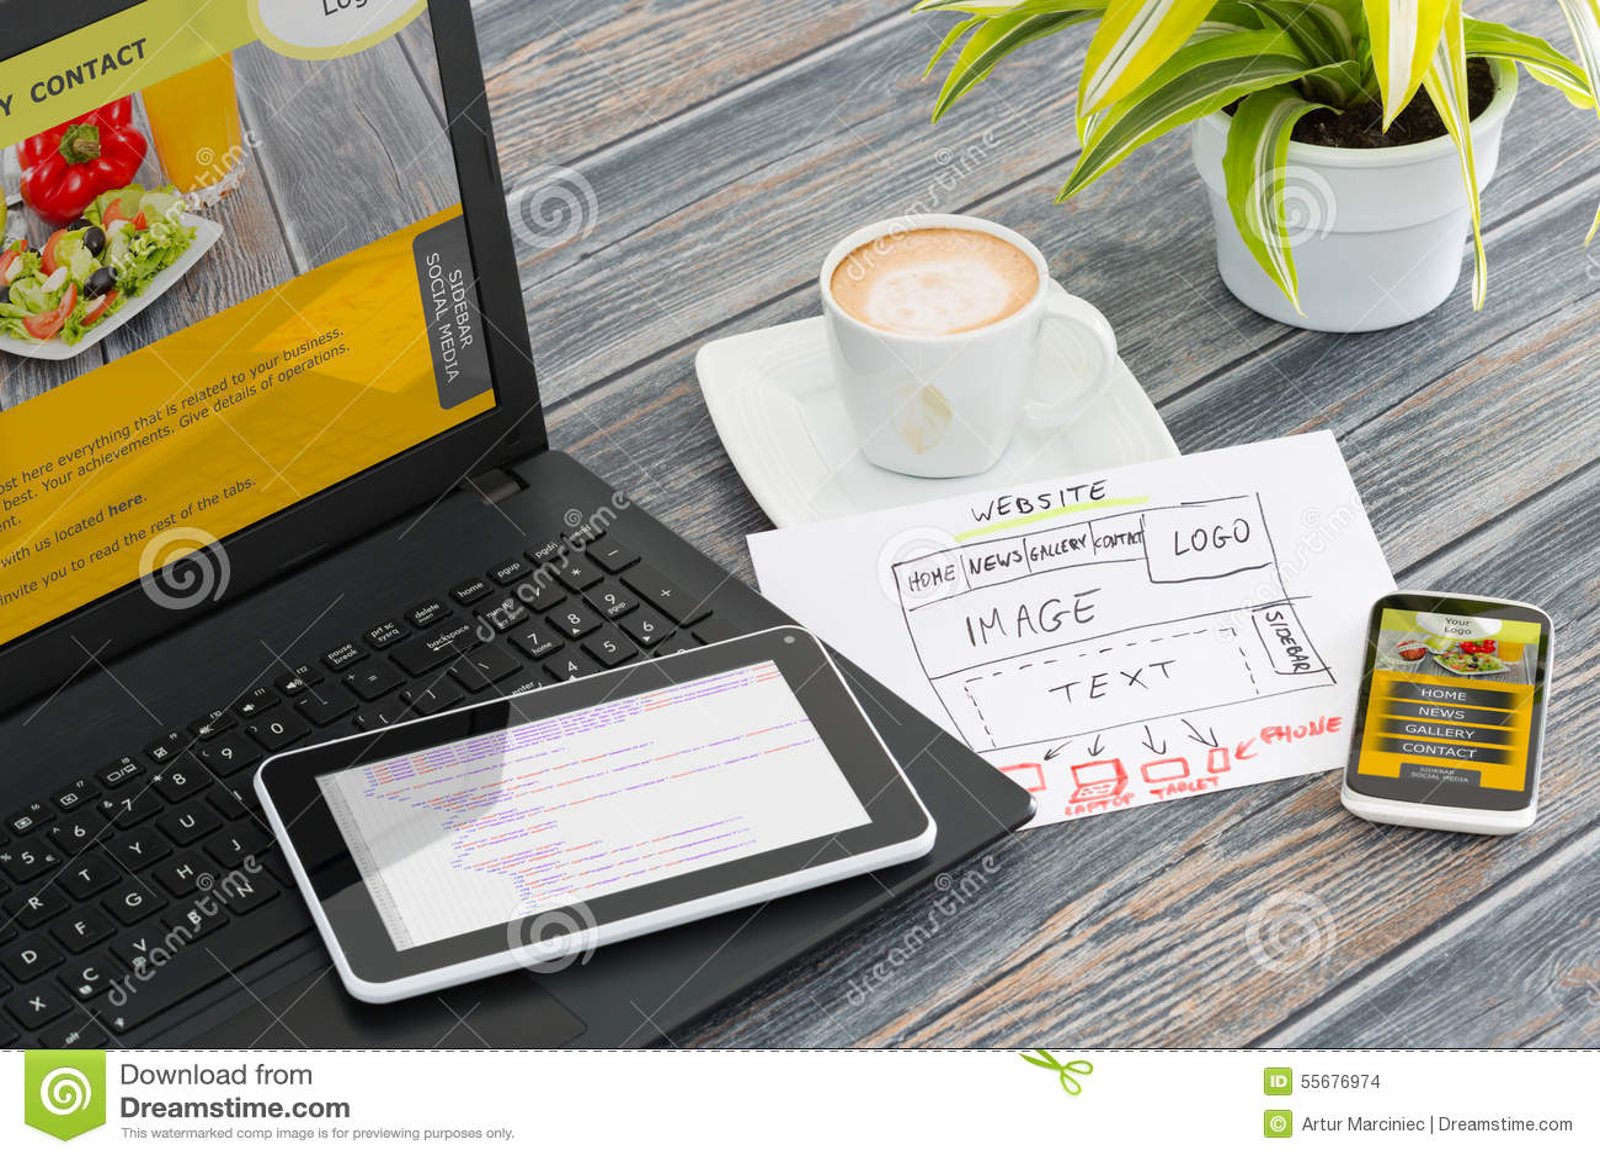 Responsive web design stock photo. Image of ideas ...